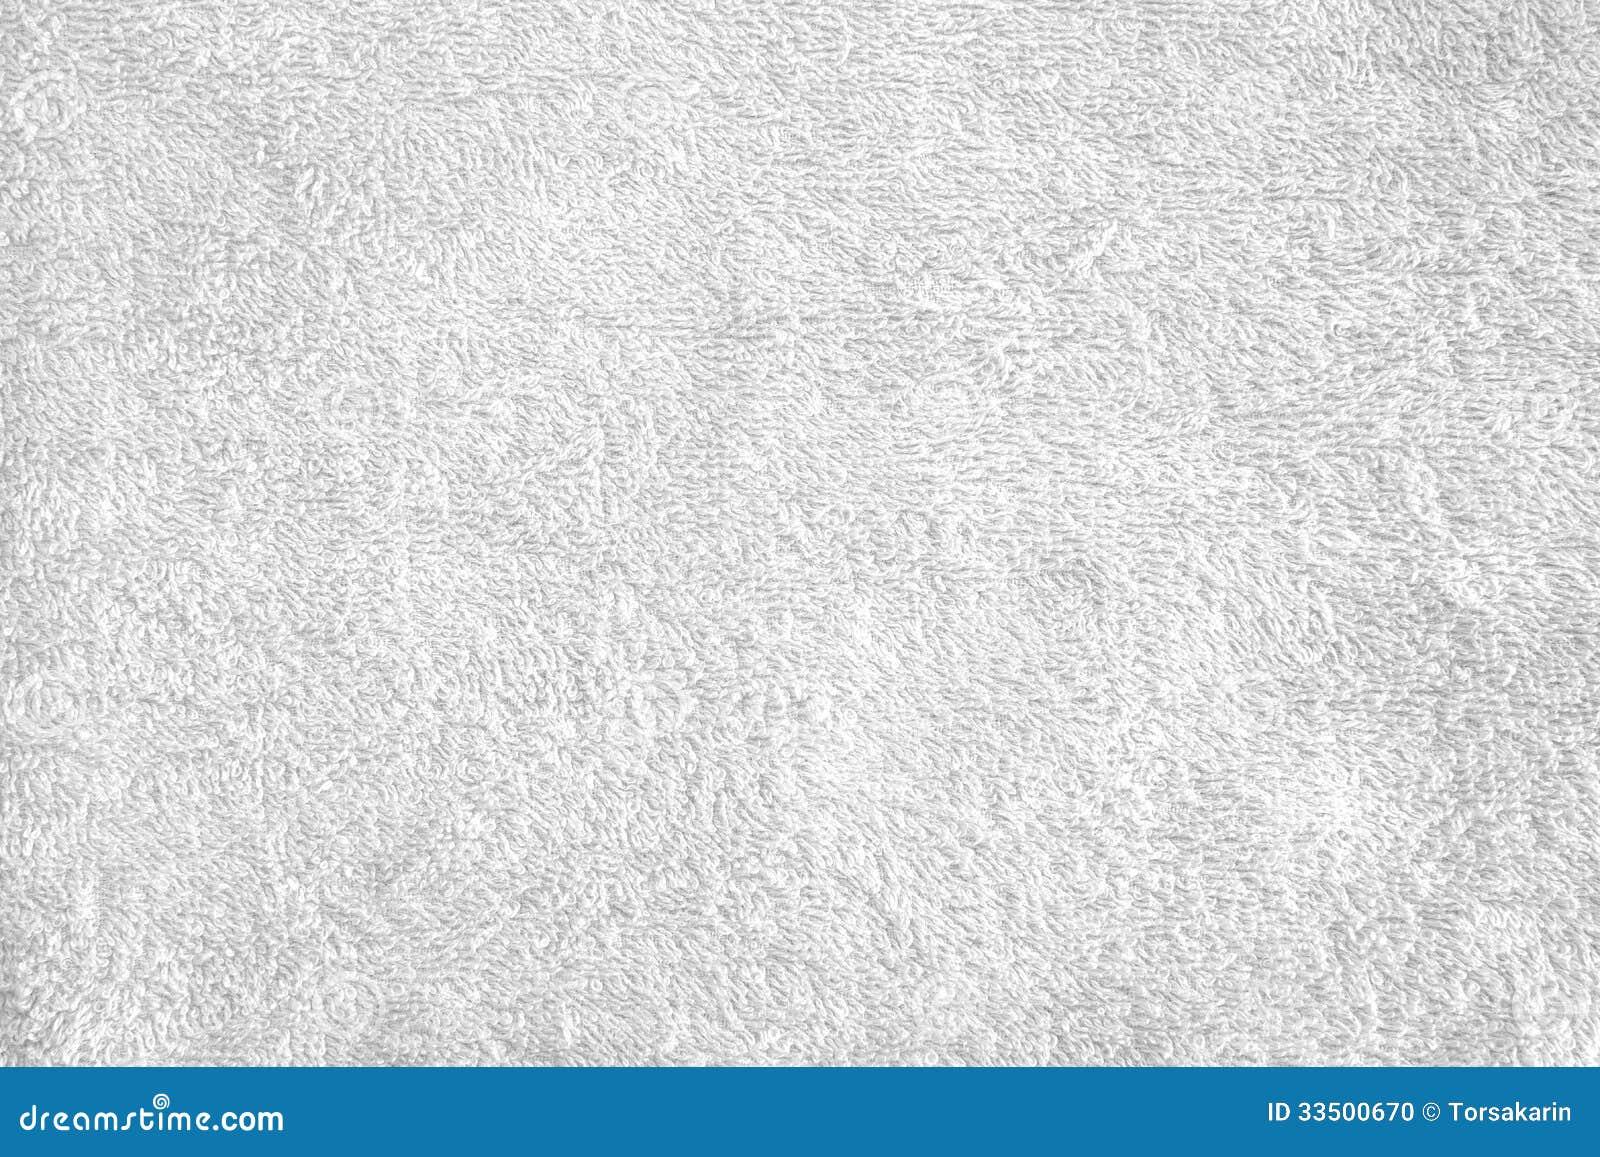 Texture Of Bright White Bath Towel Stock Photo Image